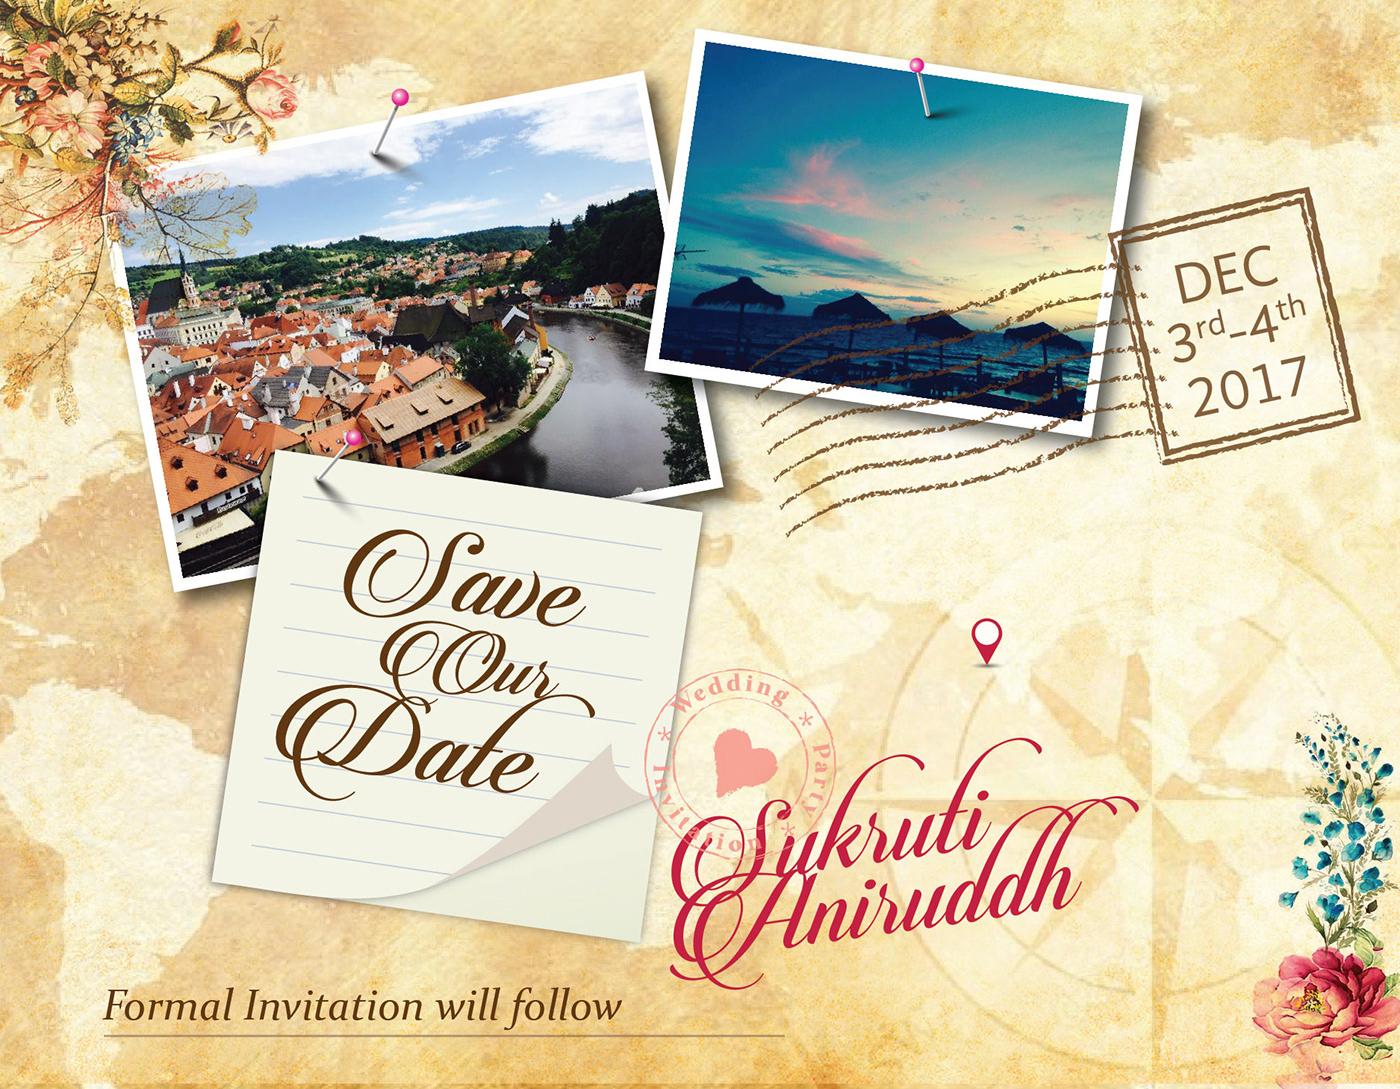 design agency designing Digital Art  digital invitation graphic design  multidisciplinary design Travel theme invite